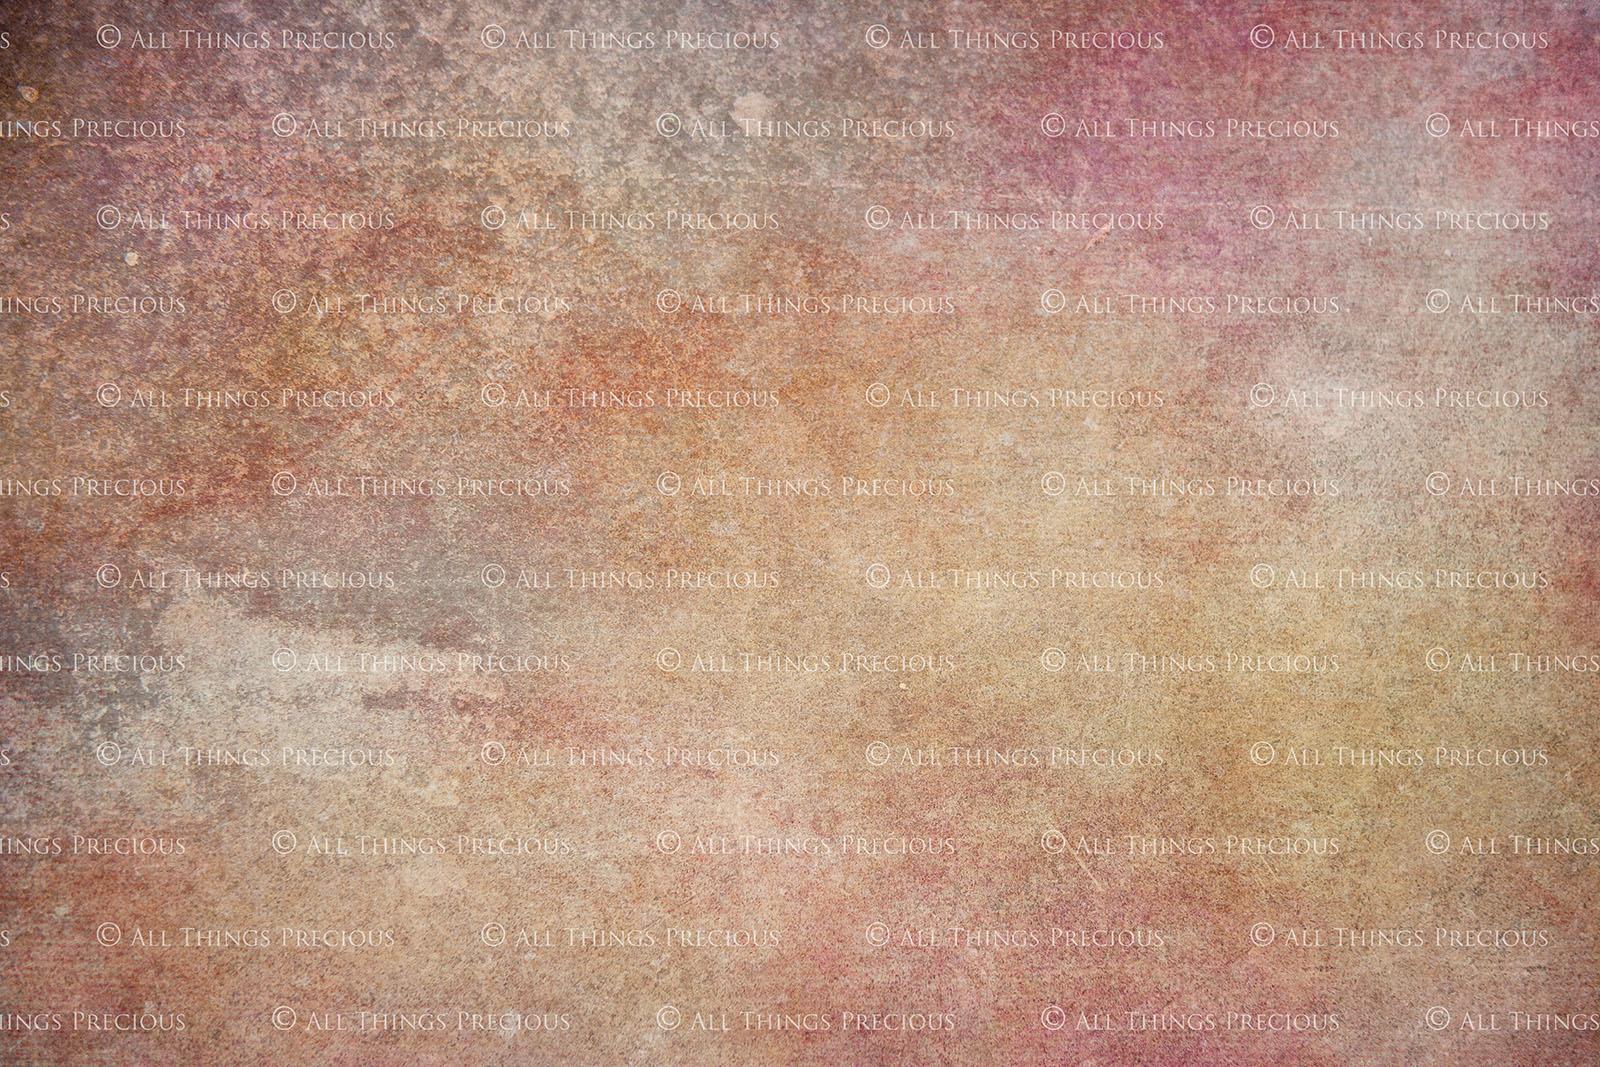 10 Fine Art BERRIES & CREAM Textures SET 1 example image 7